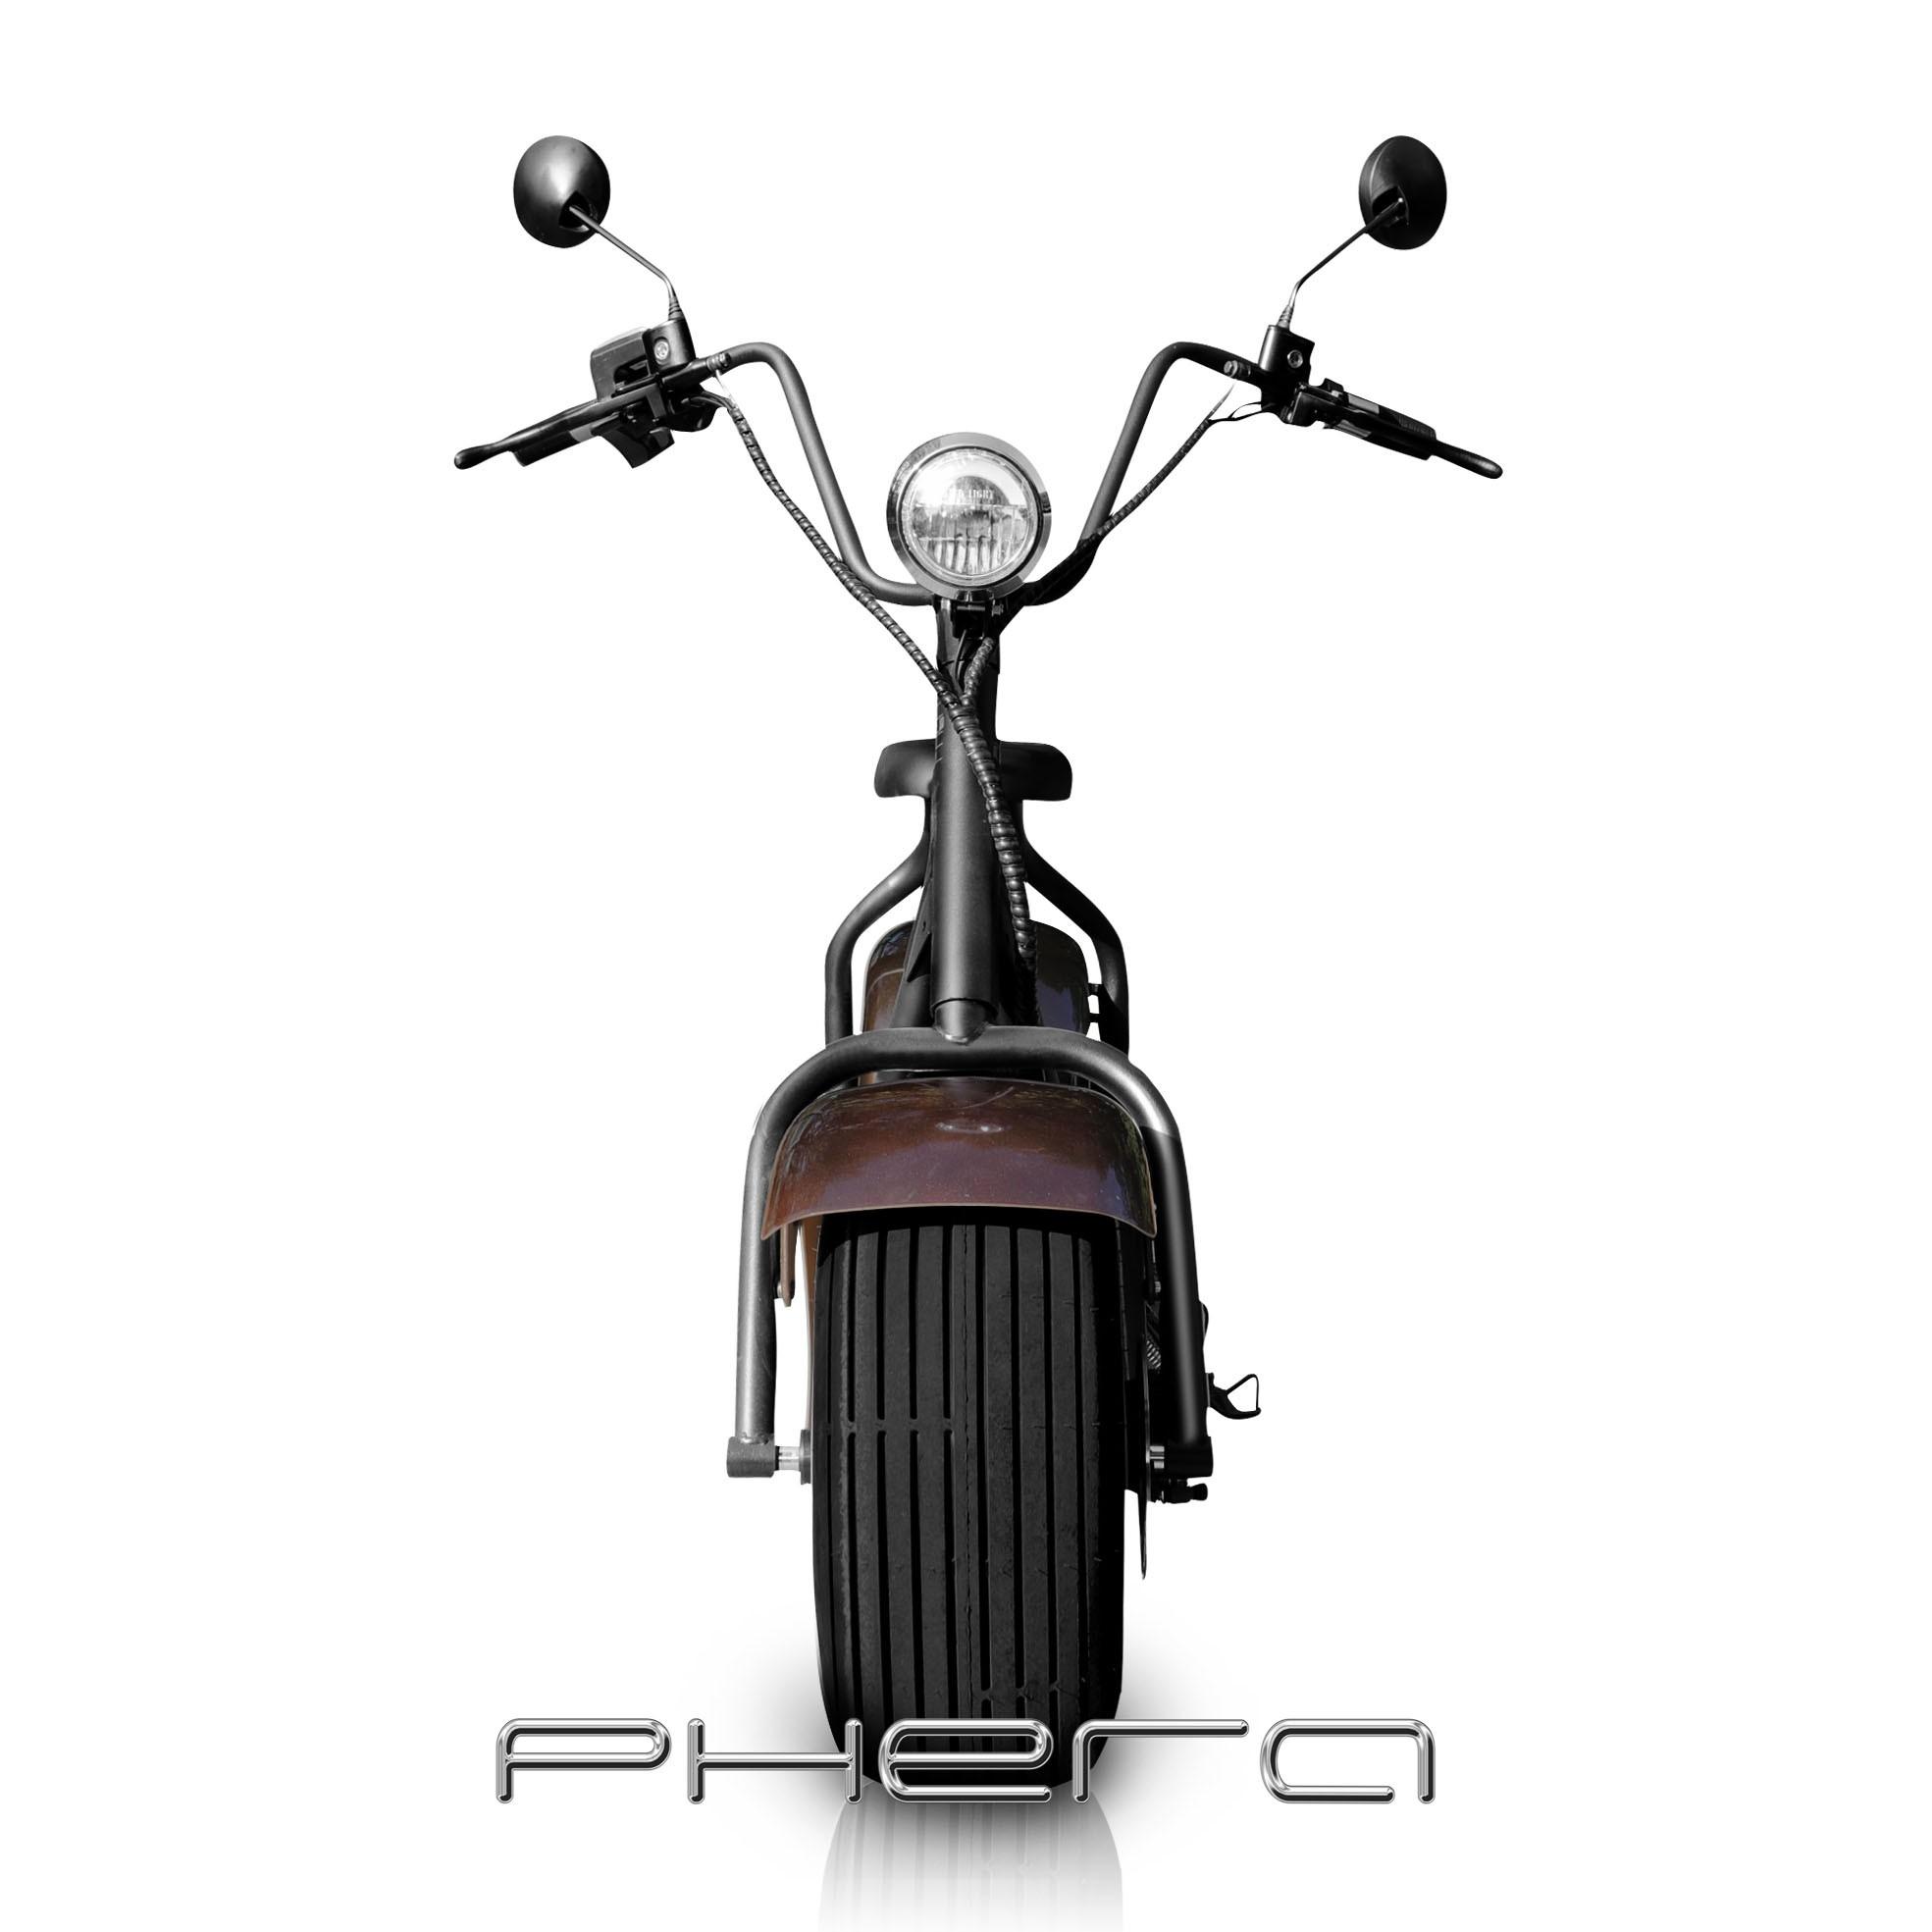 Moto Elétrica Scooter Phera F300 1500w 45kmh max180kg